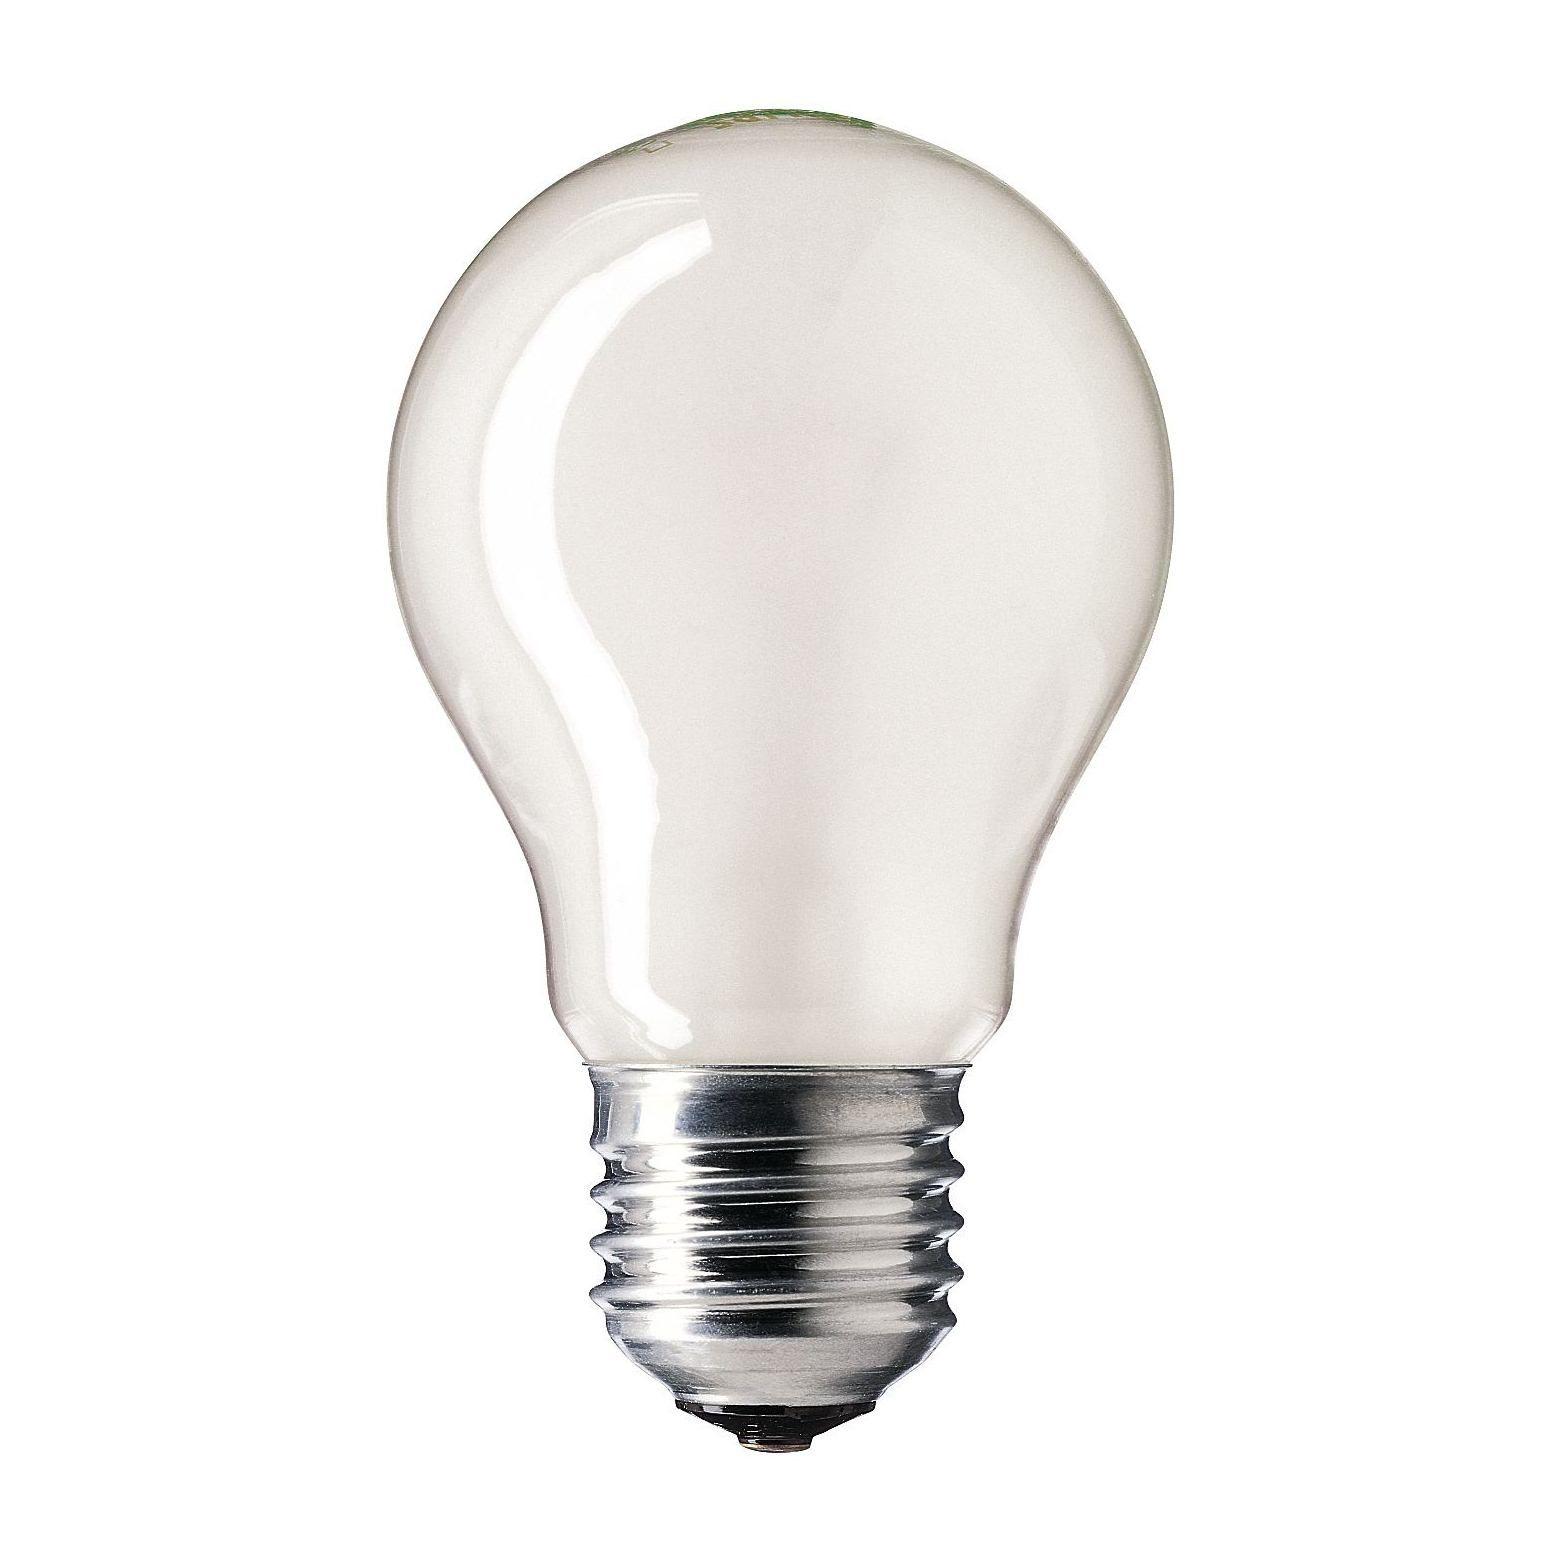 Купить Лампа накаливания Philips STANDARD 75W E27 230V A55 FR 1CT/12X10F Pila матовая